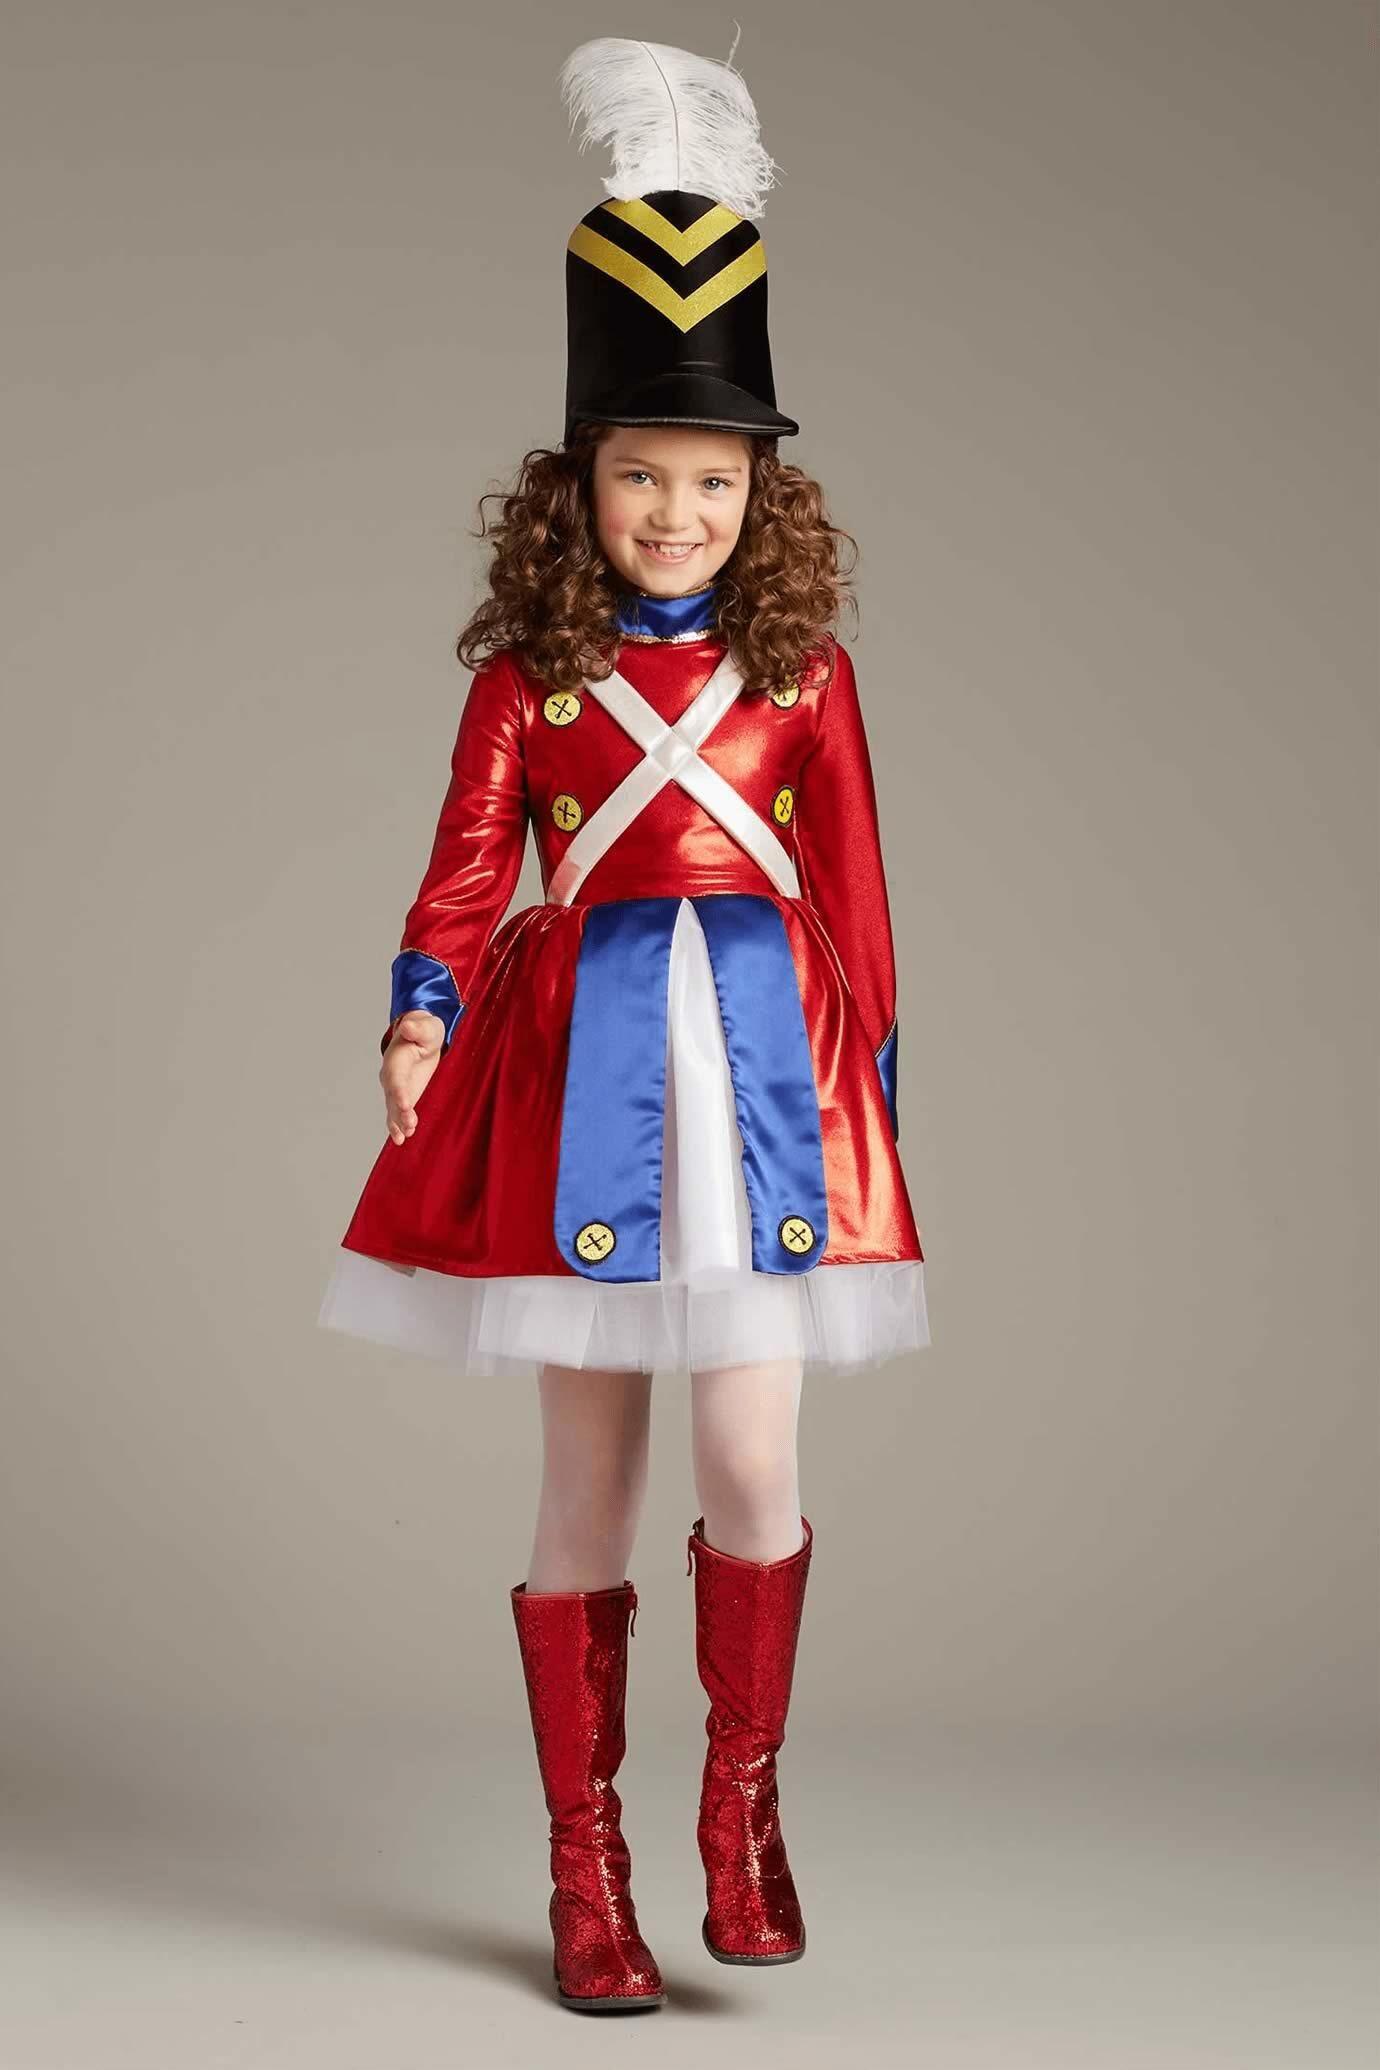 LADIES TOY SOLDIER COSTUME WOMEN/'S MAJORETTE NUTCRACKER FANCY DRESS CHRISTMAS